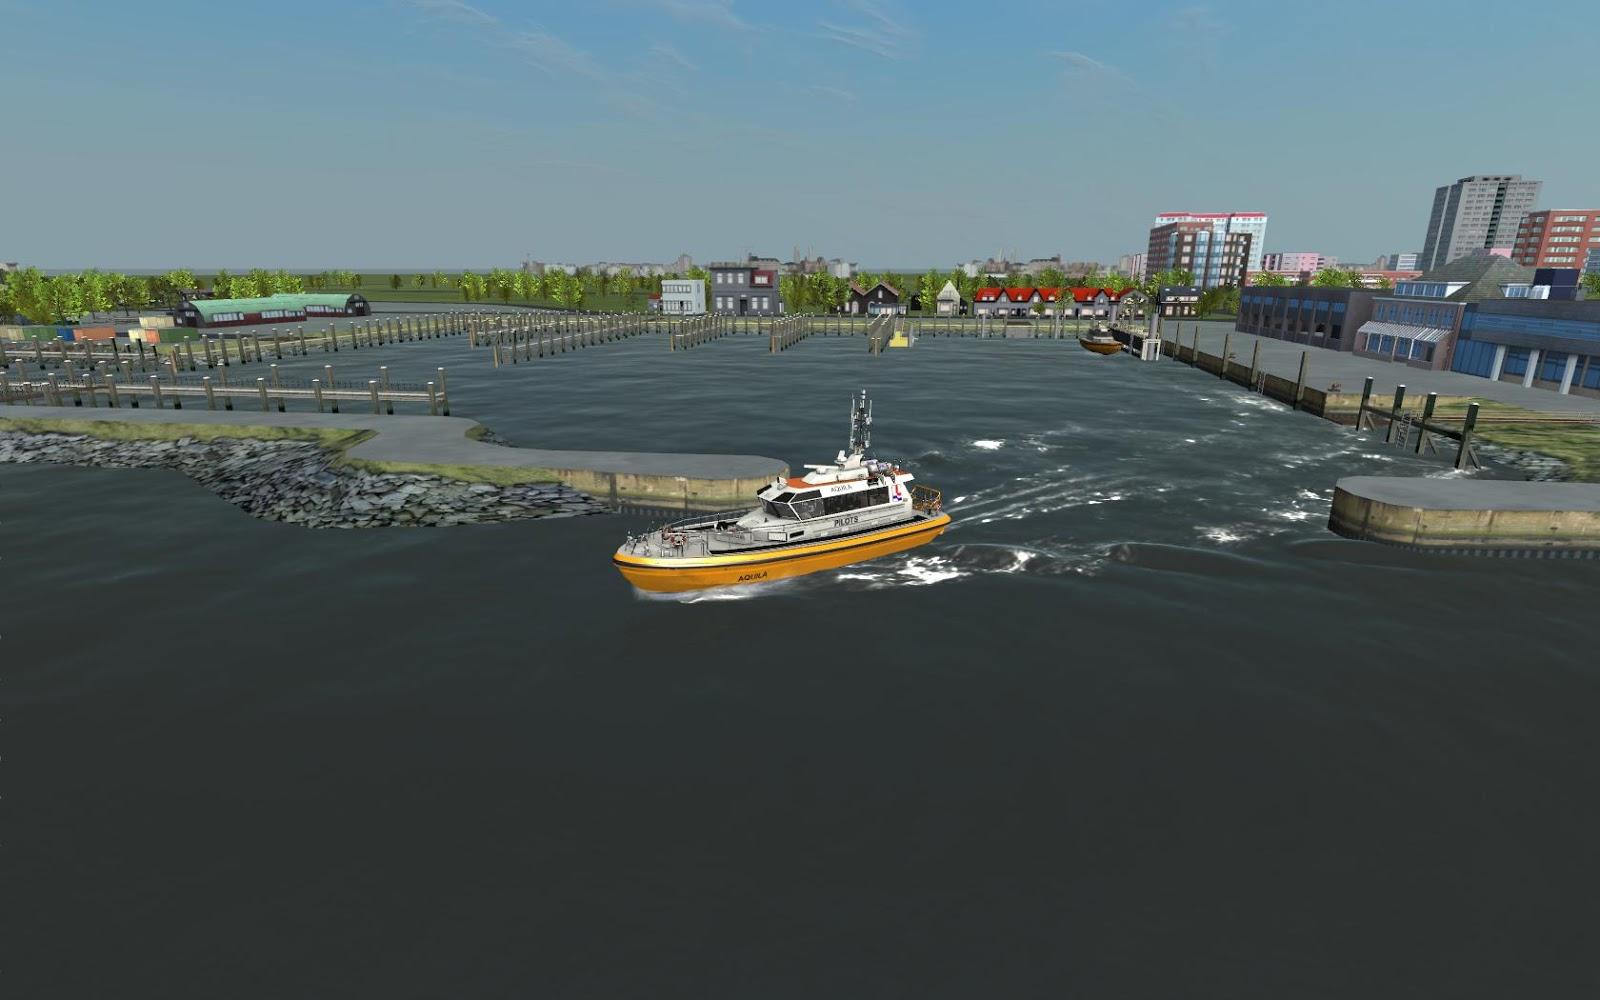 Ship simulator games free download full version windows 7